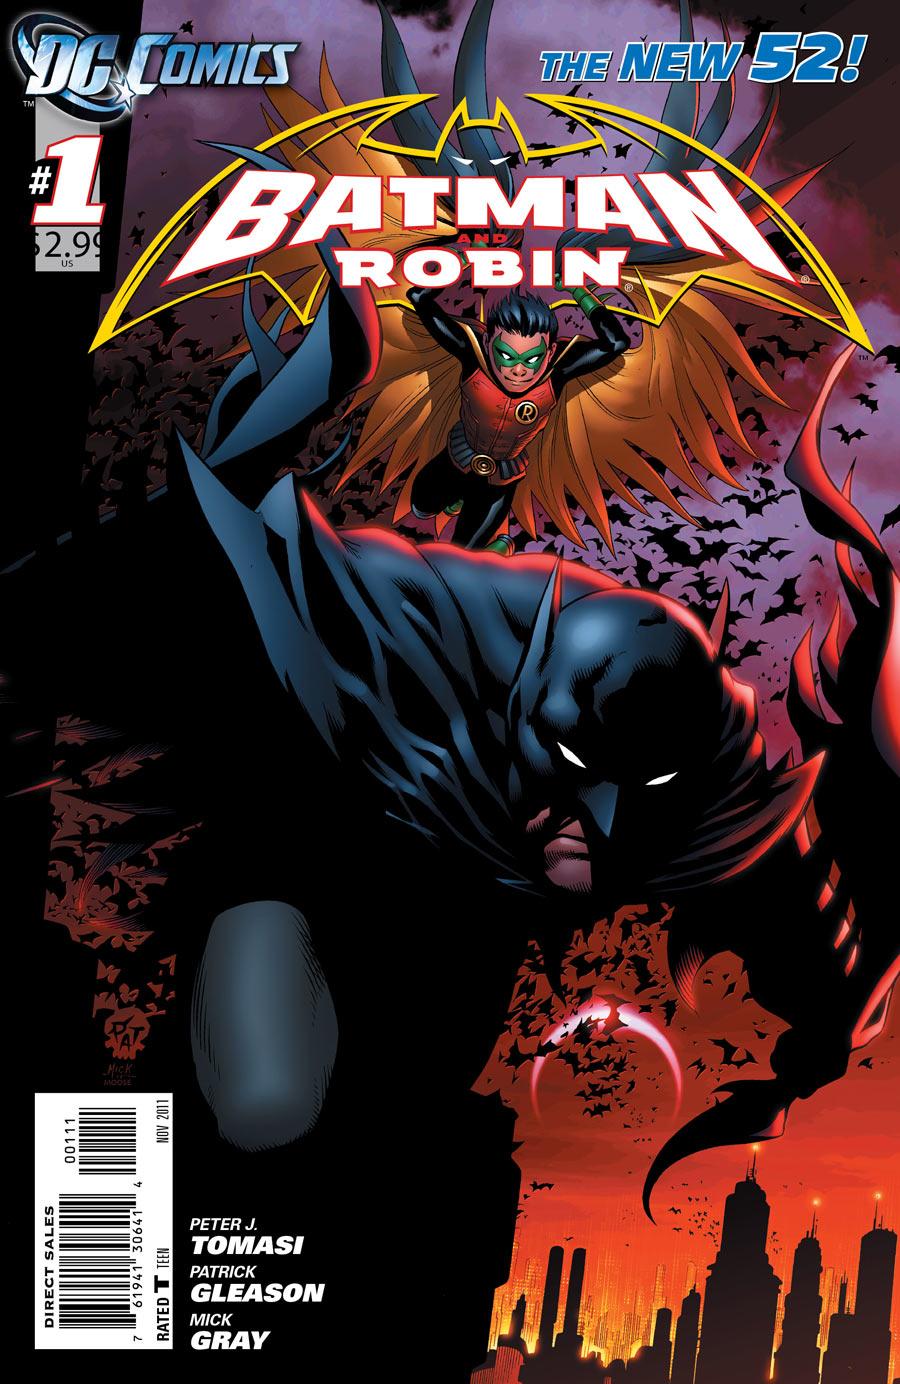 Batman and Robin #1 cover